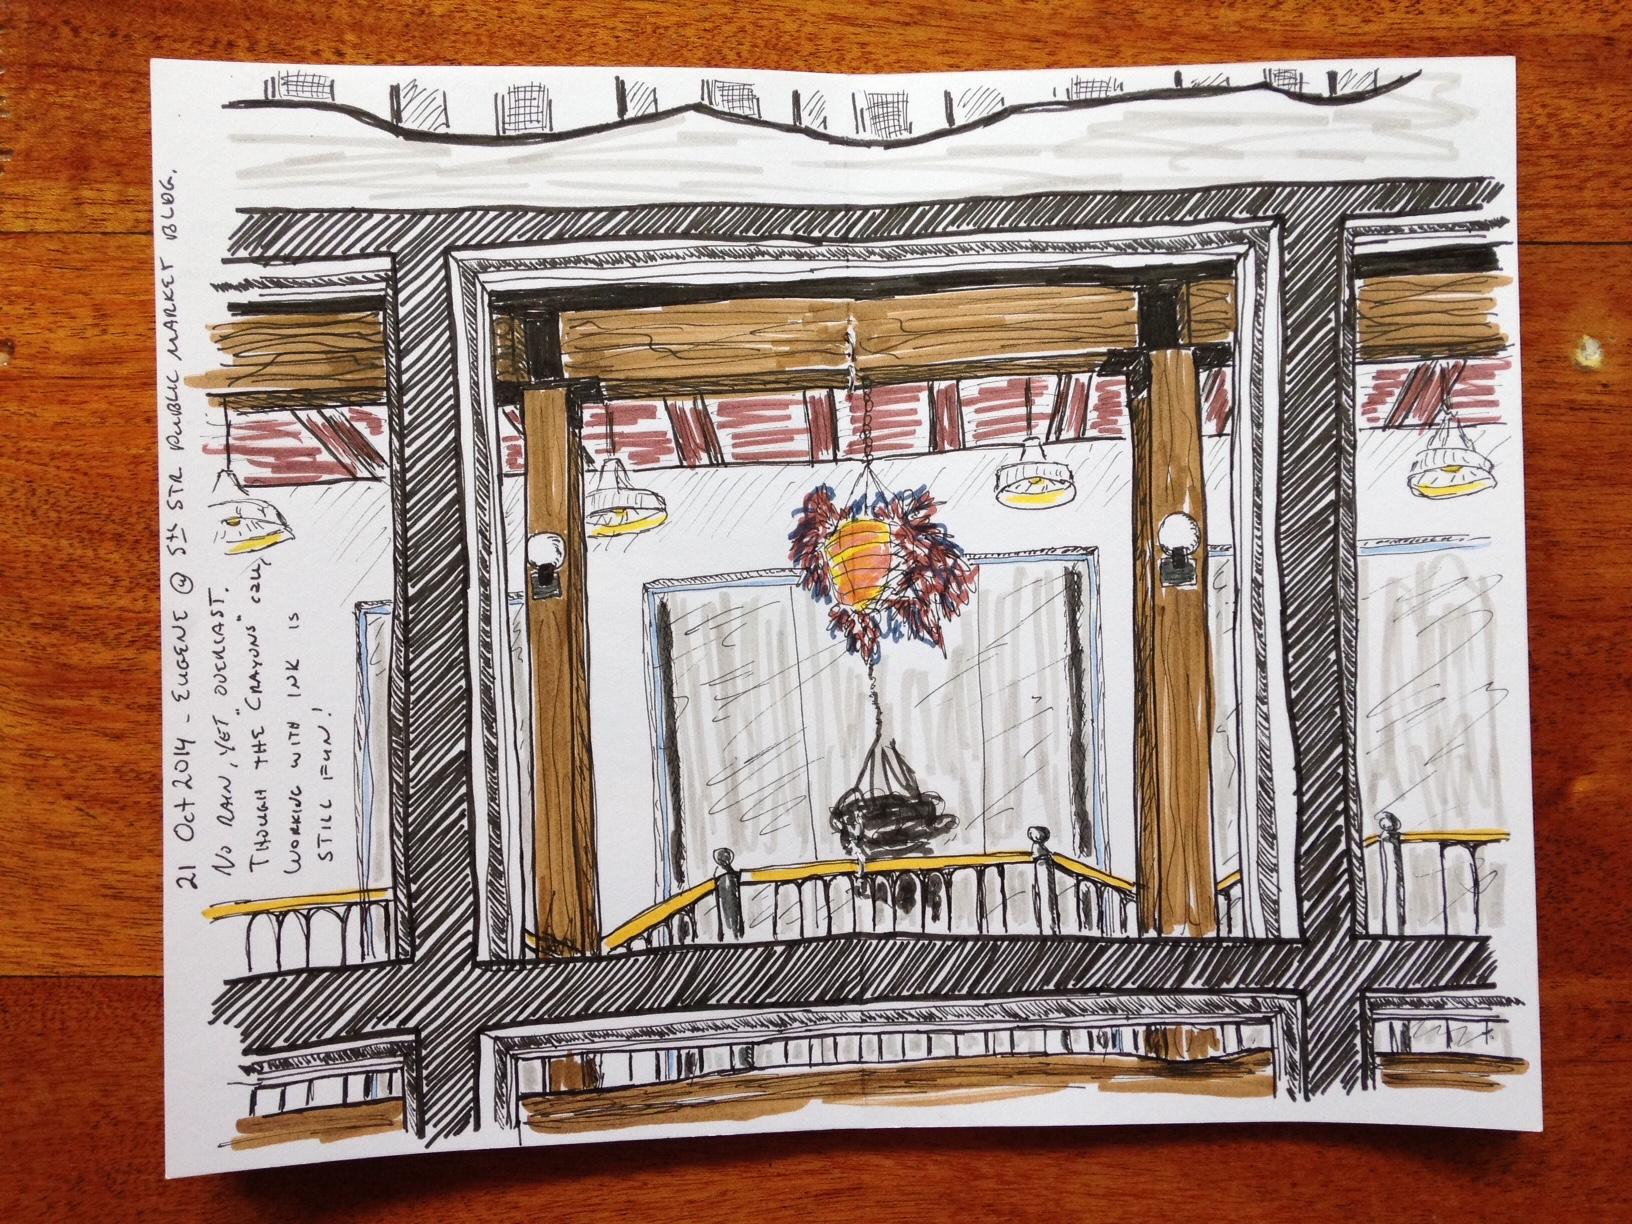 Hugh's sketch